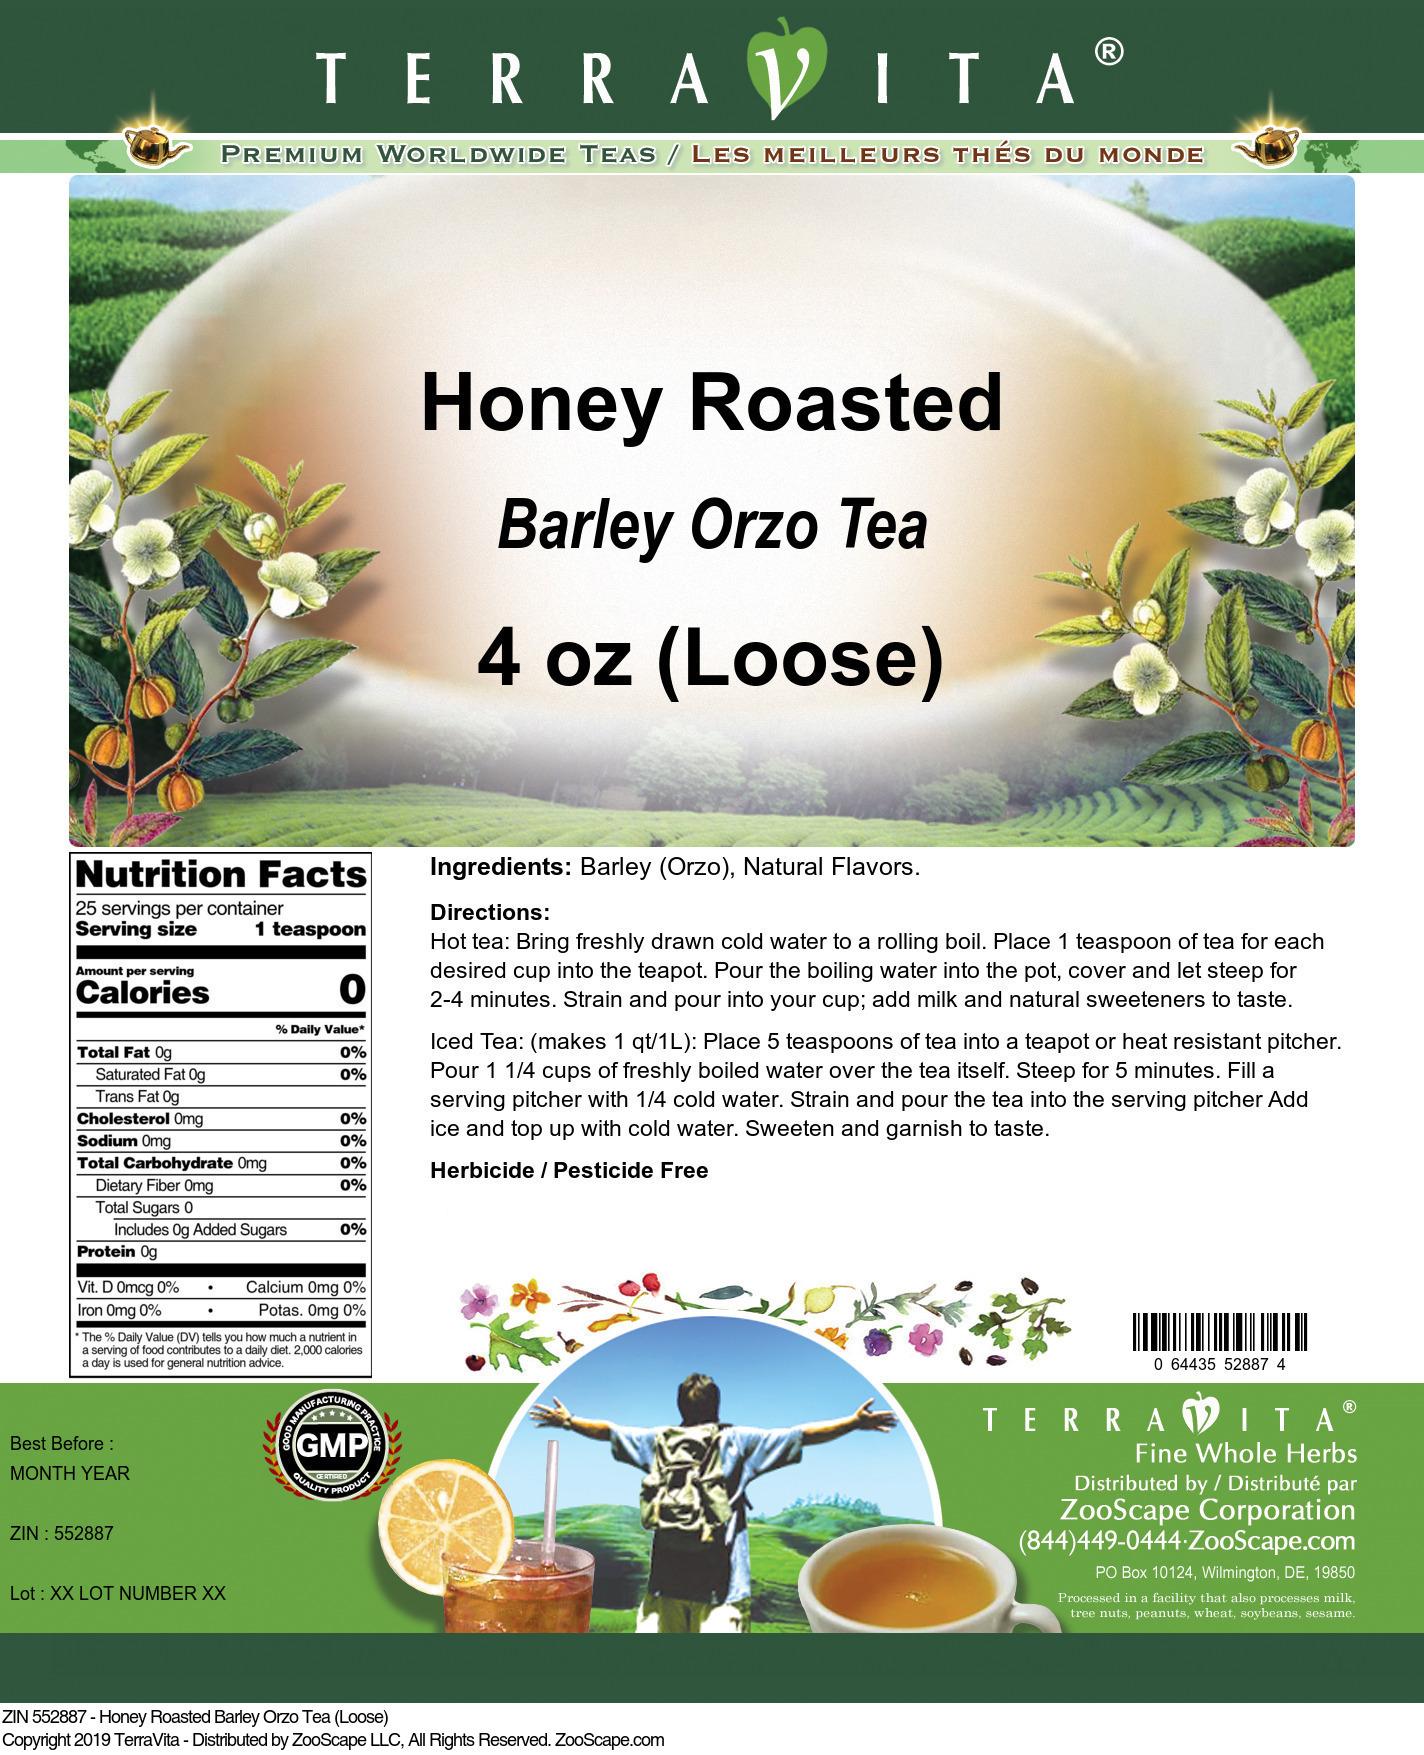 Honey Roasted Barley Orzo